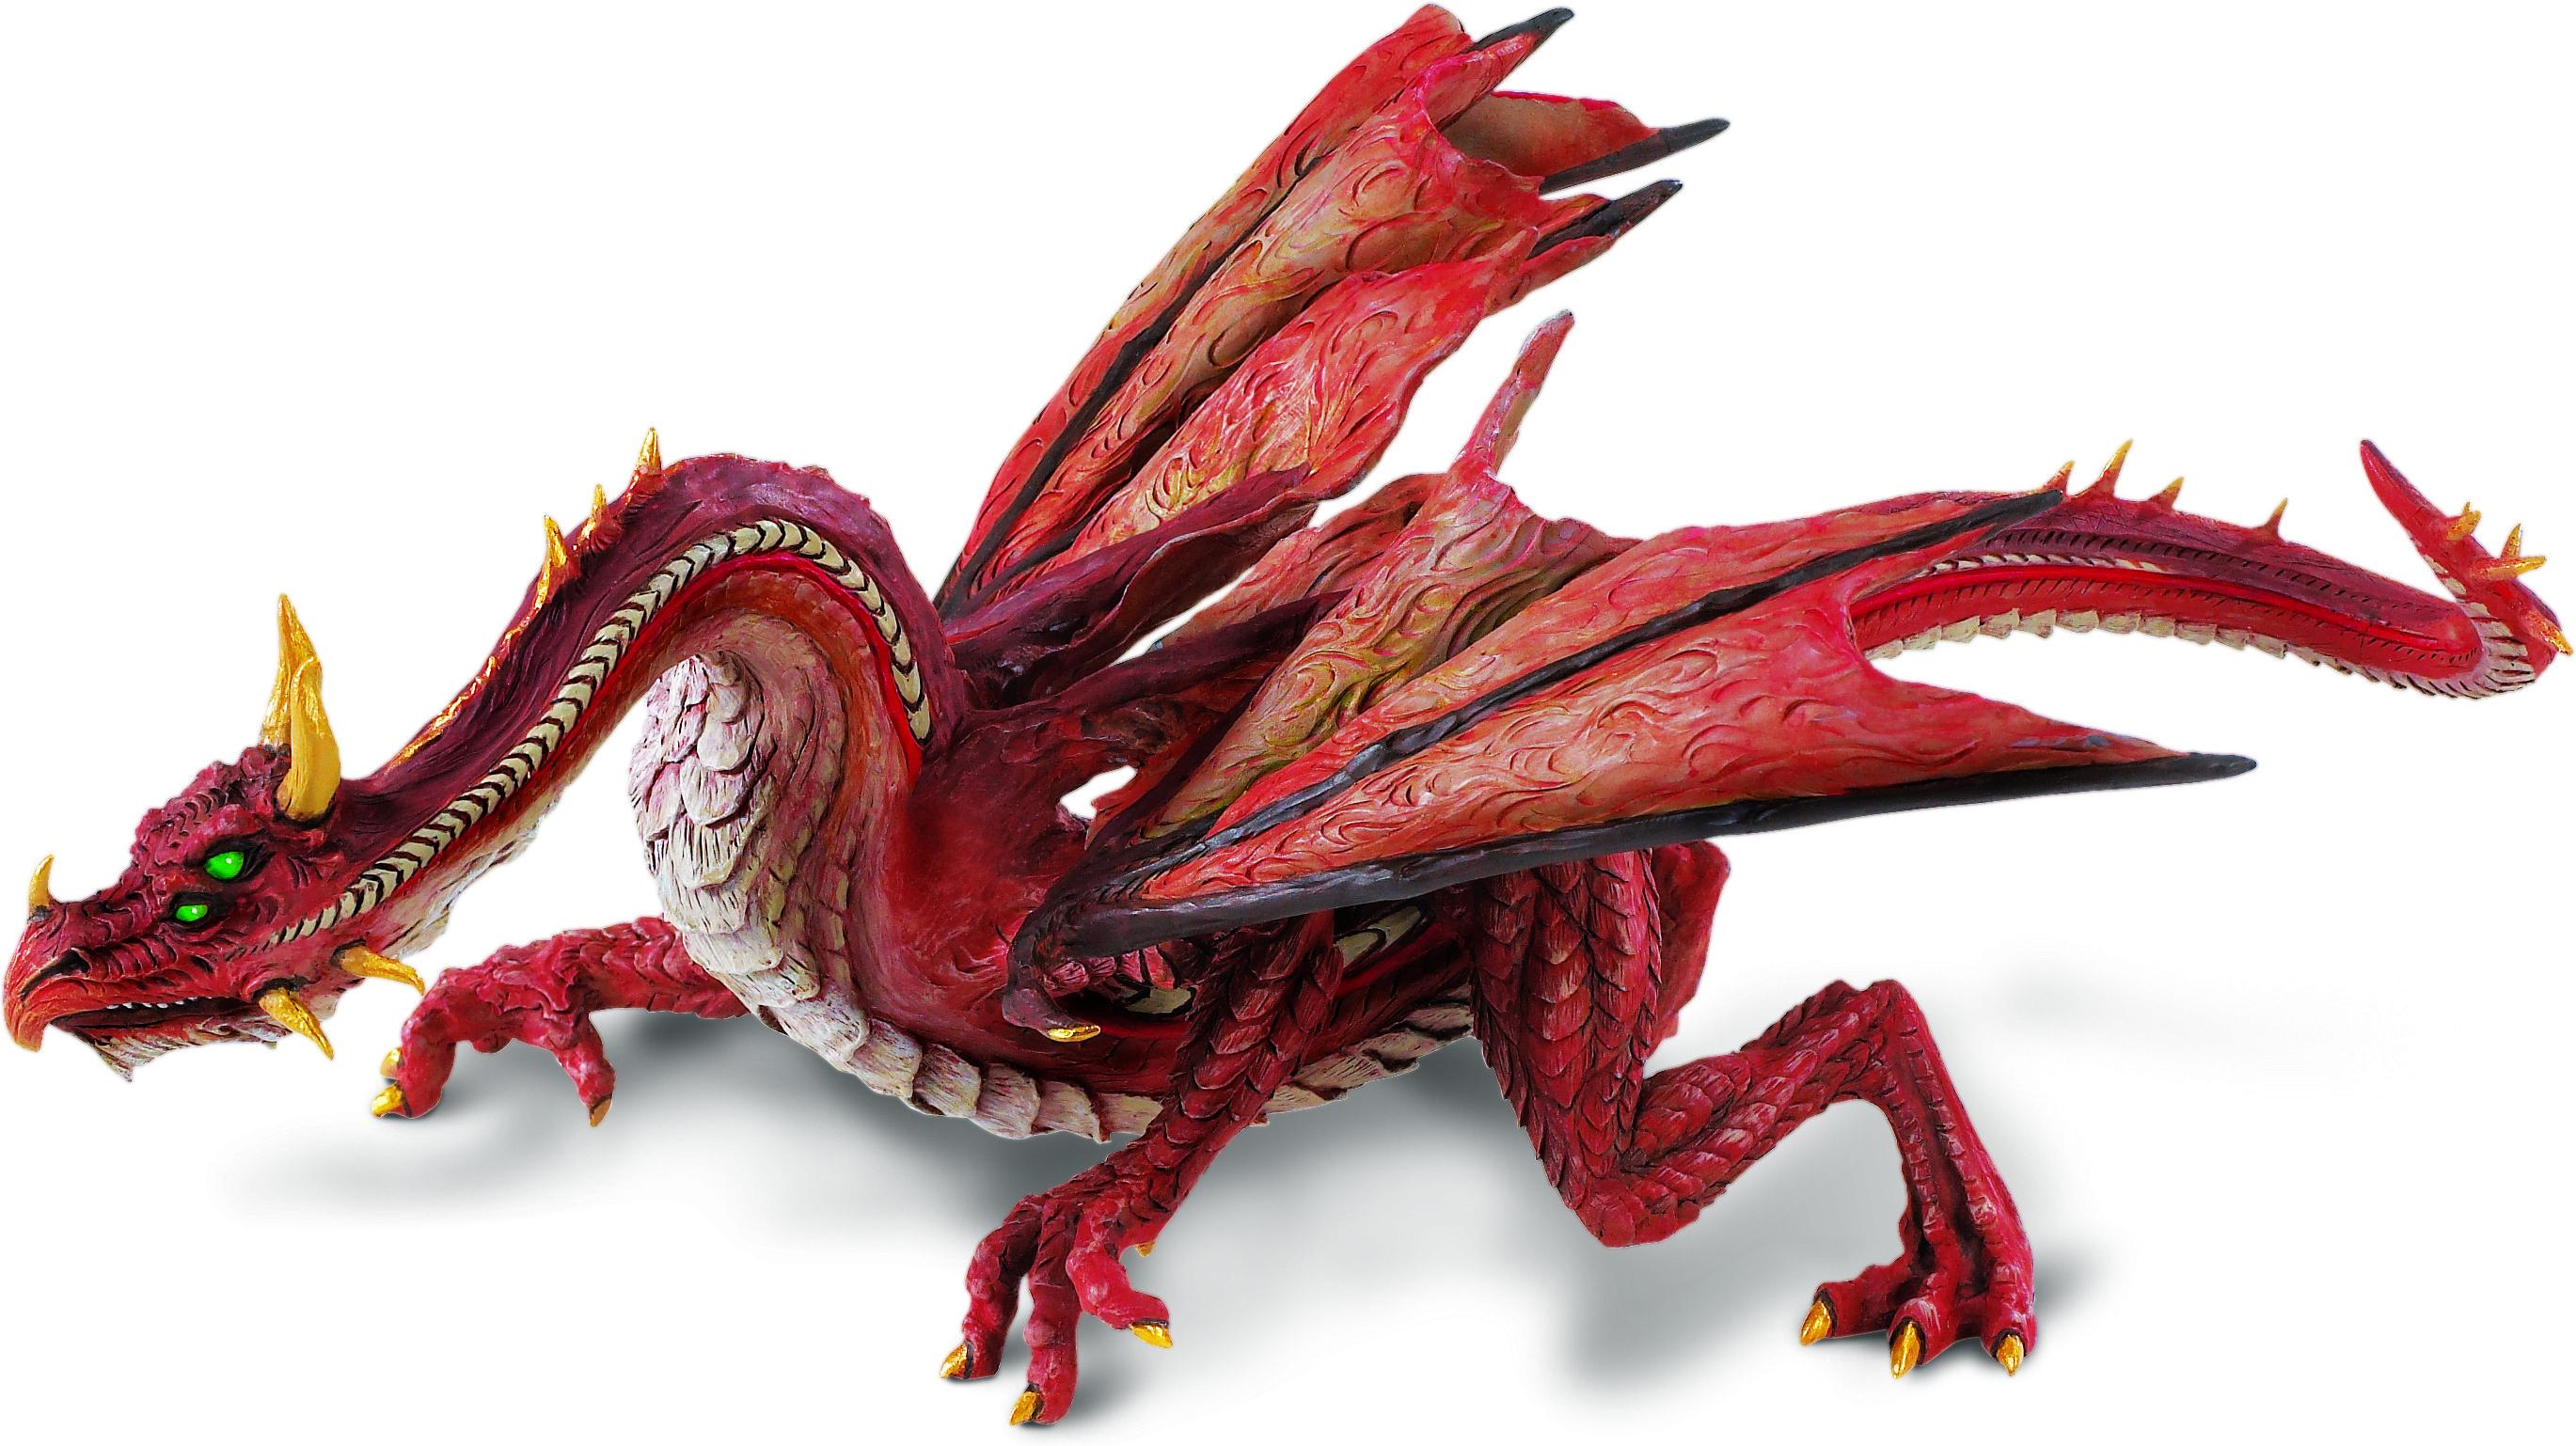 safari ltd mountain dragon mountain dragon shop for safari ltd products in india toys for 4. Black Bedroom Furniture Sets. Home Design Ideas